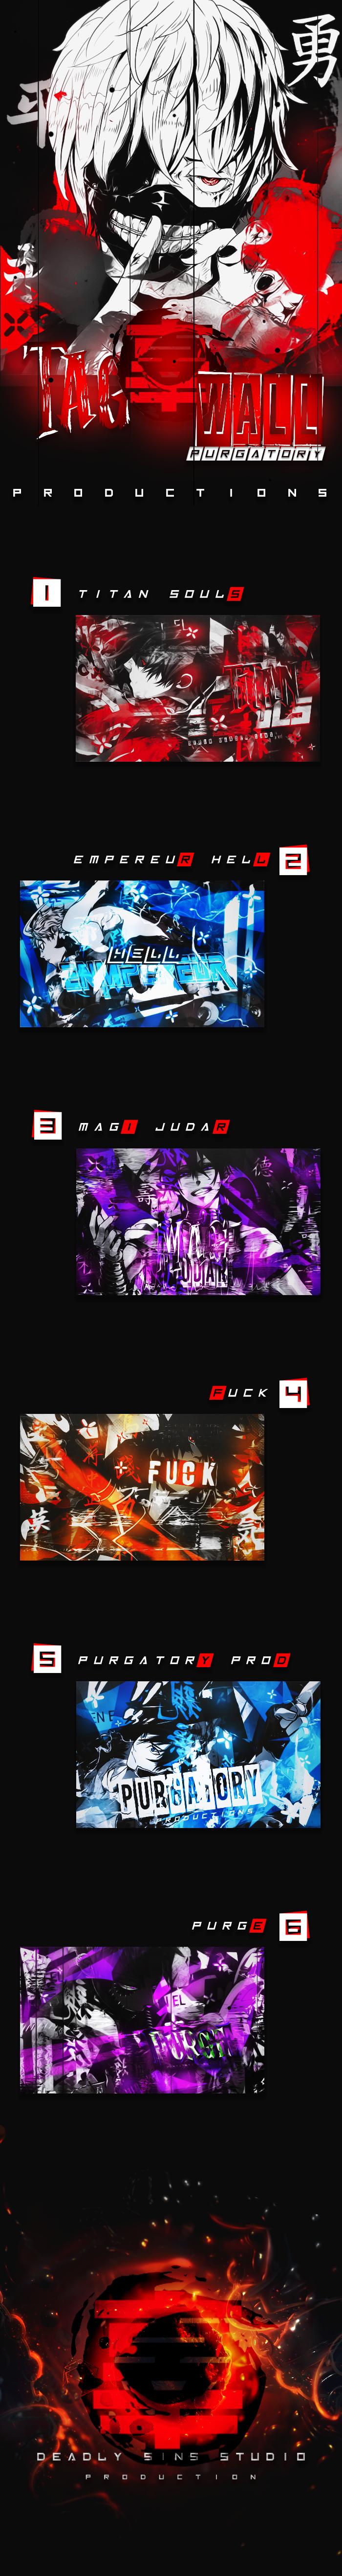 Daisuke 1511571892-tag-wall-purgatory-productions